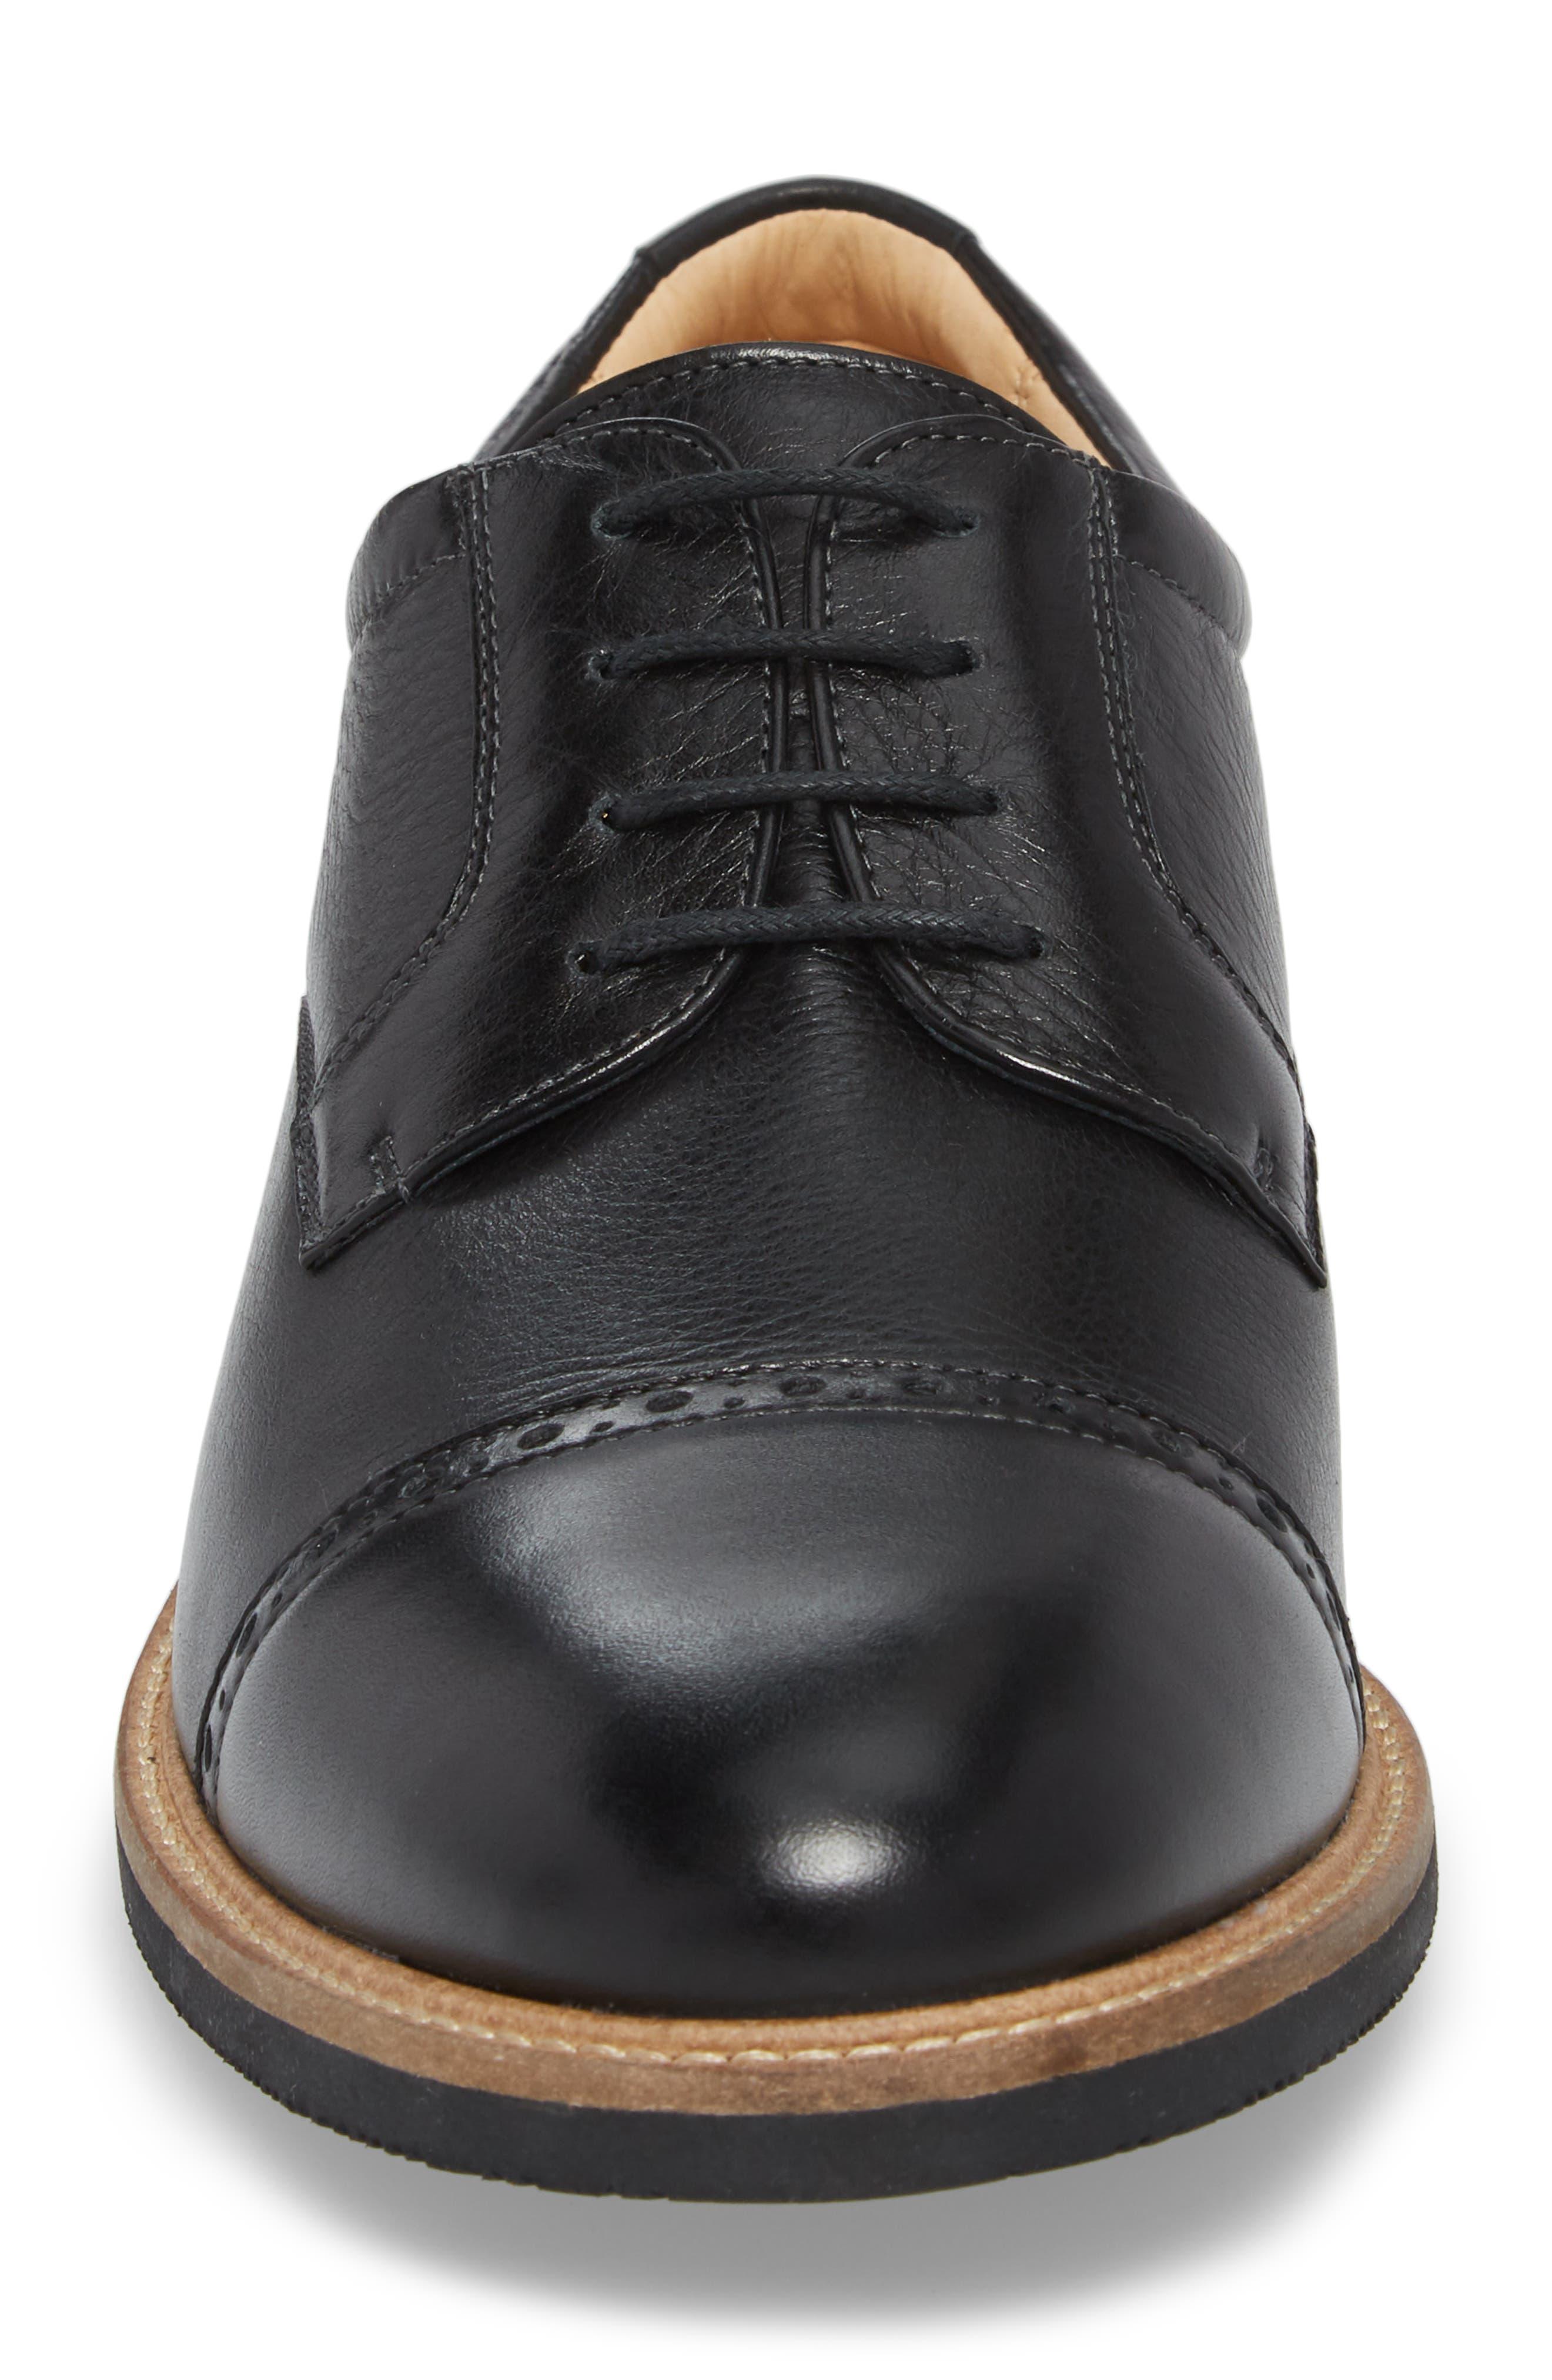 Barlow Cap Toe Derby,                             Alternate thumbnail 4, color,                             Black Leather